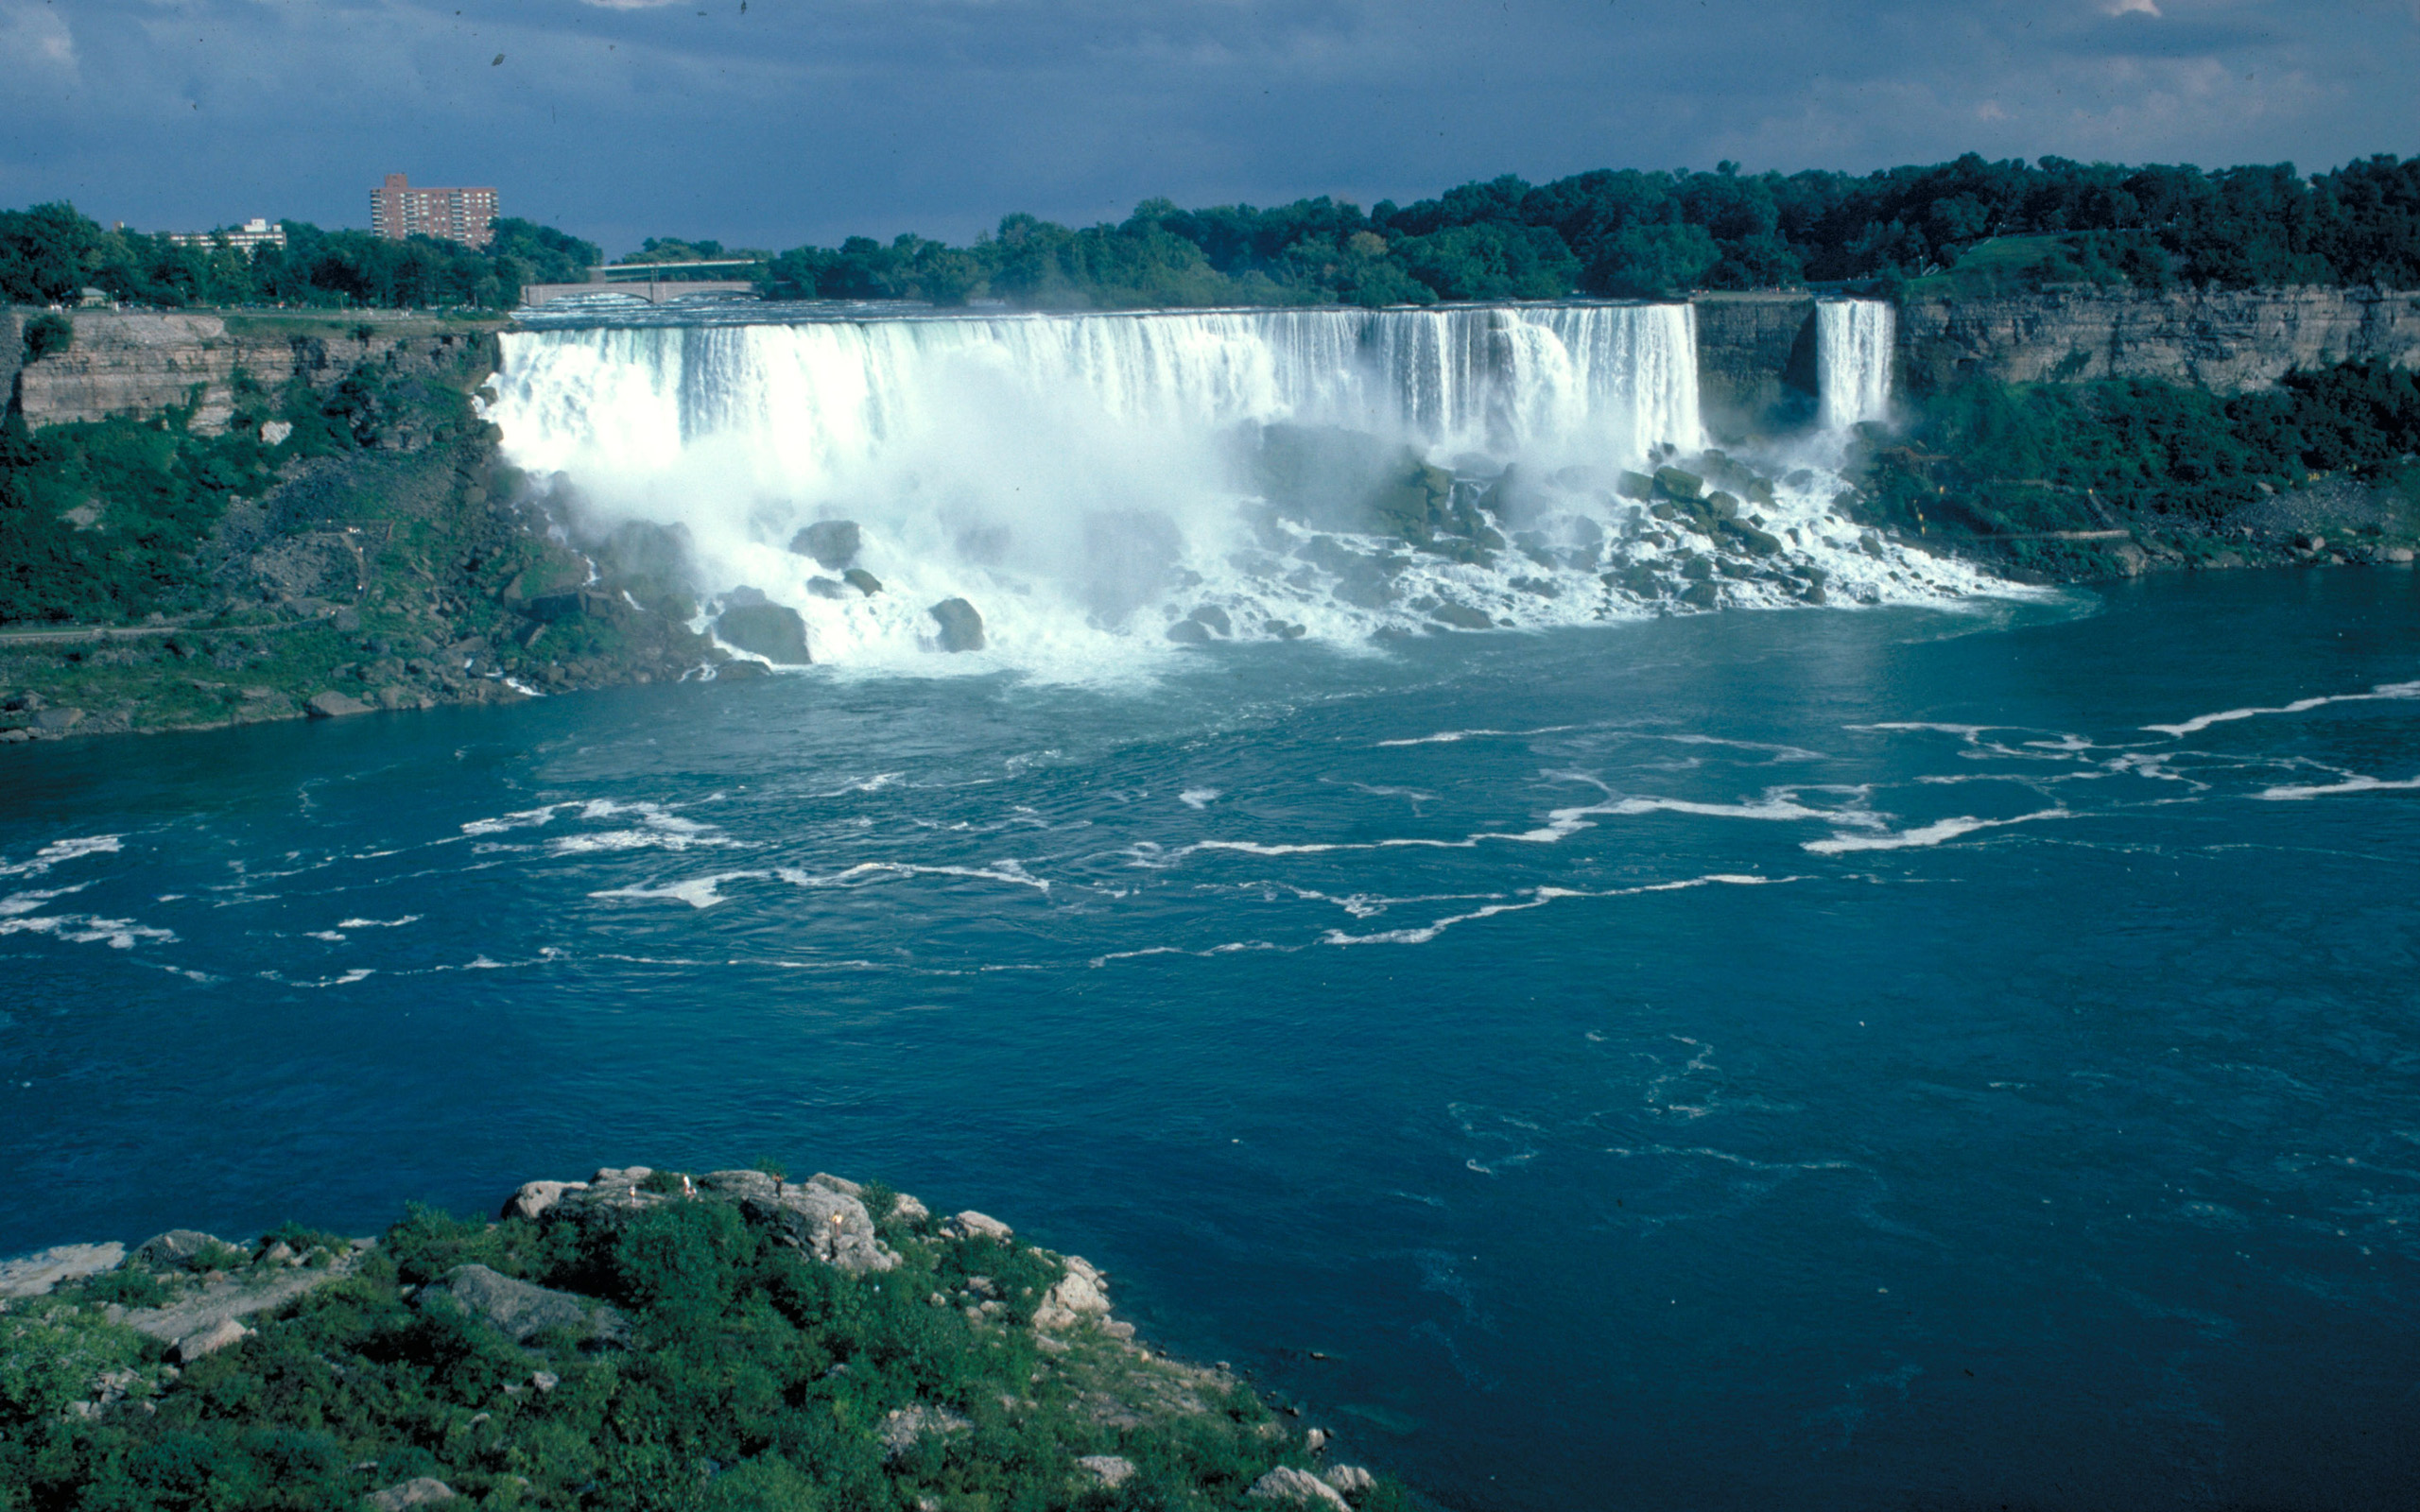 Blue banshee falls photo